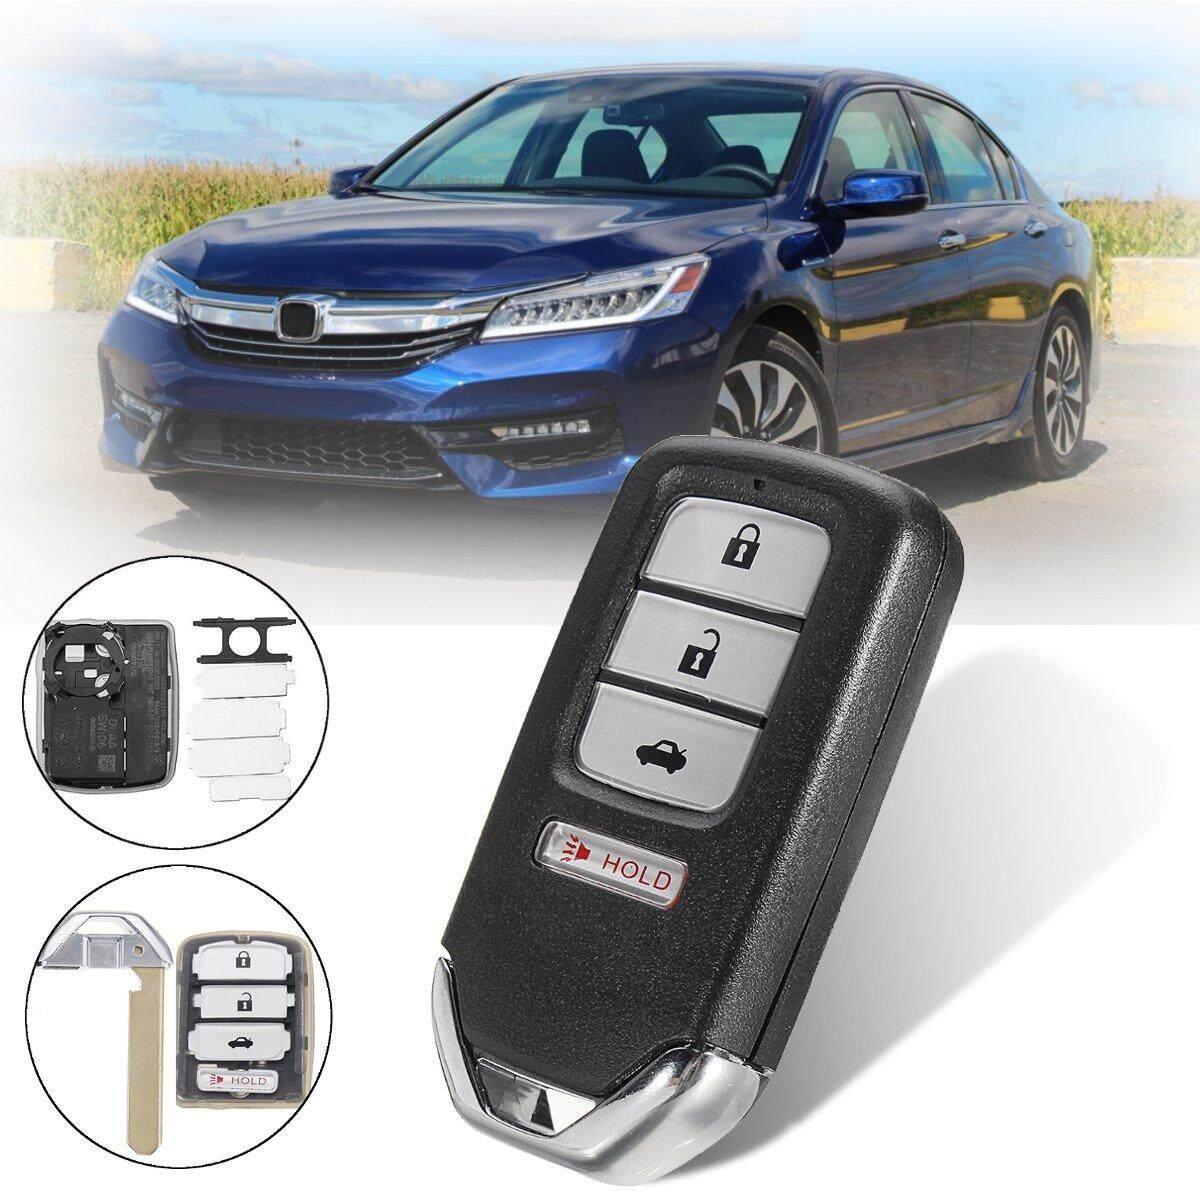 3 + 1 Tombol Remote Kunci Fob Case Shell Dengan Pisau Untuk Honda Accord Civic Crv